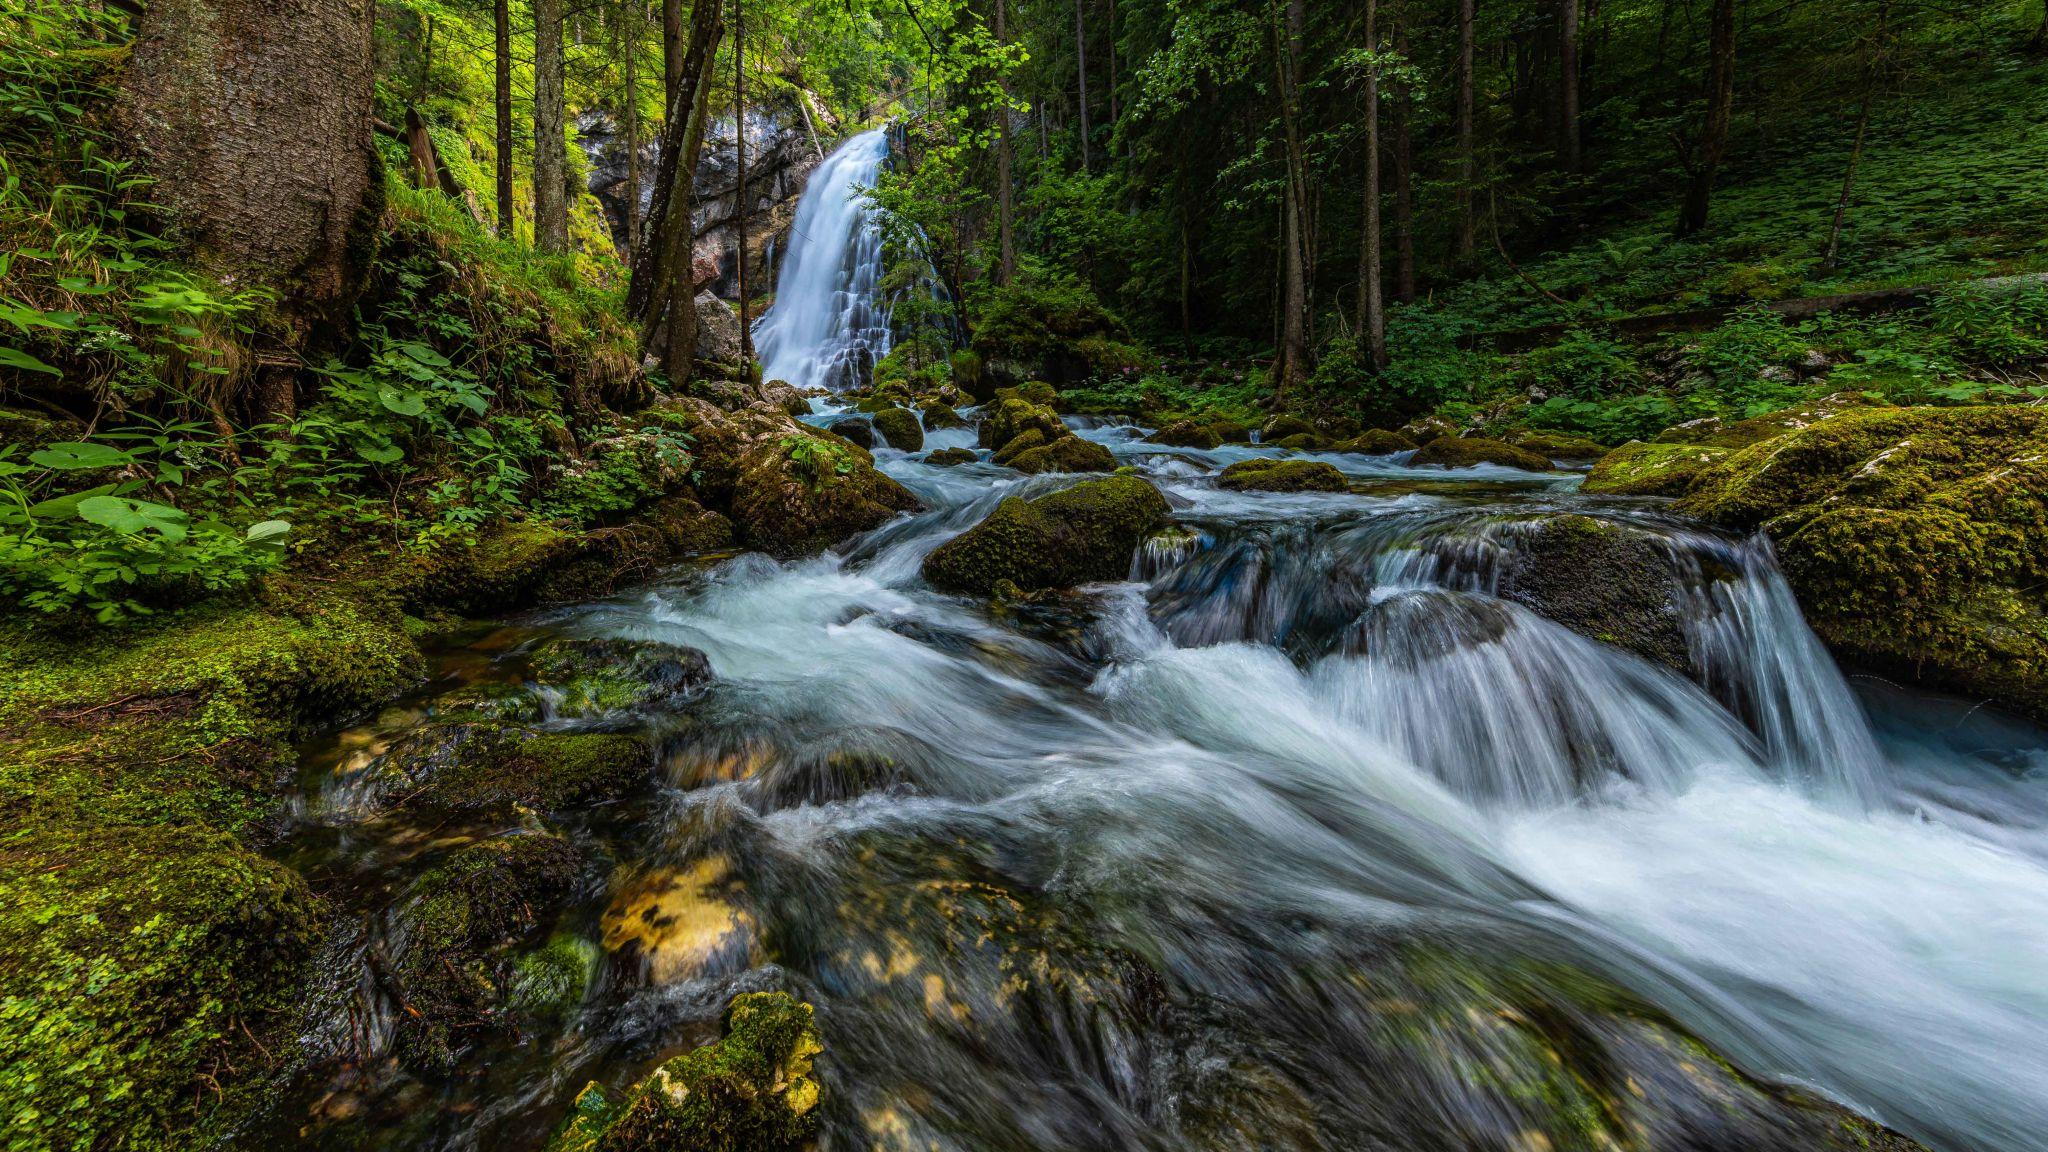 Gollinger Wasserfall (Gollinger Waterfall), Austria